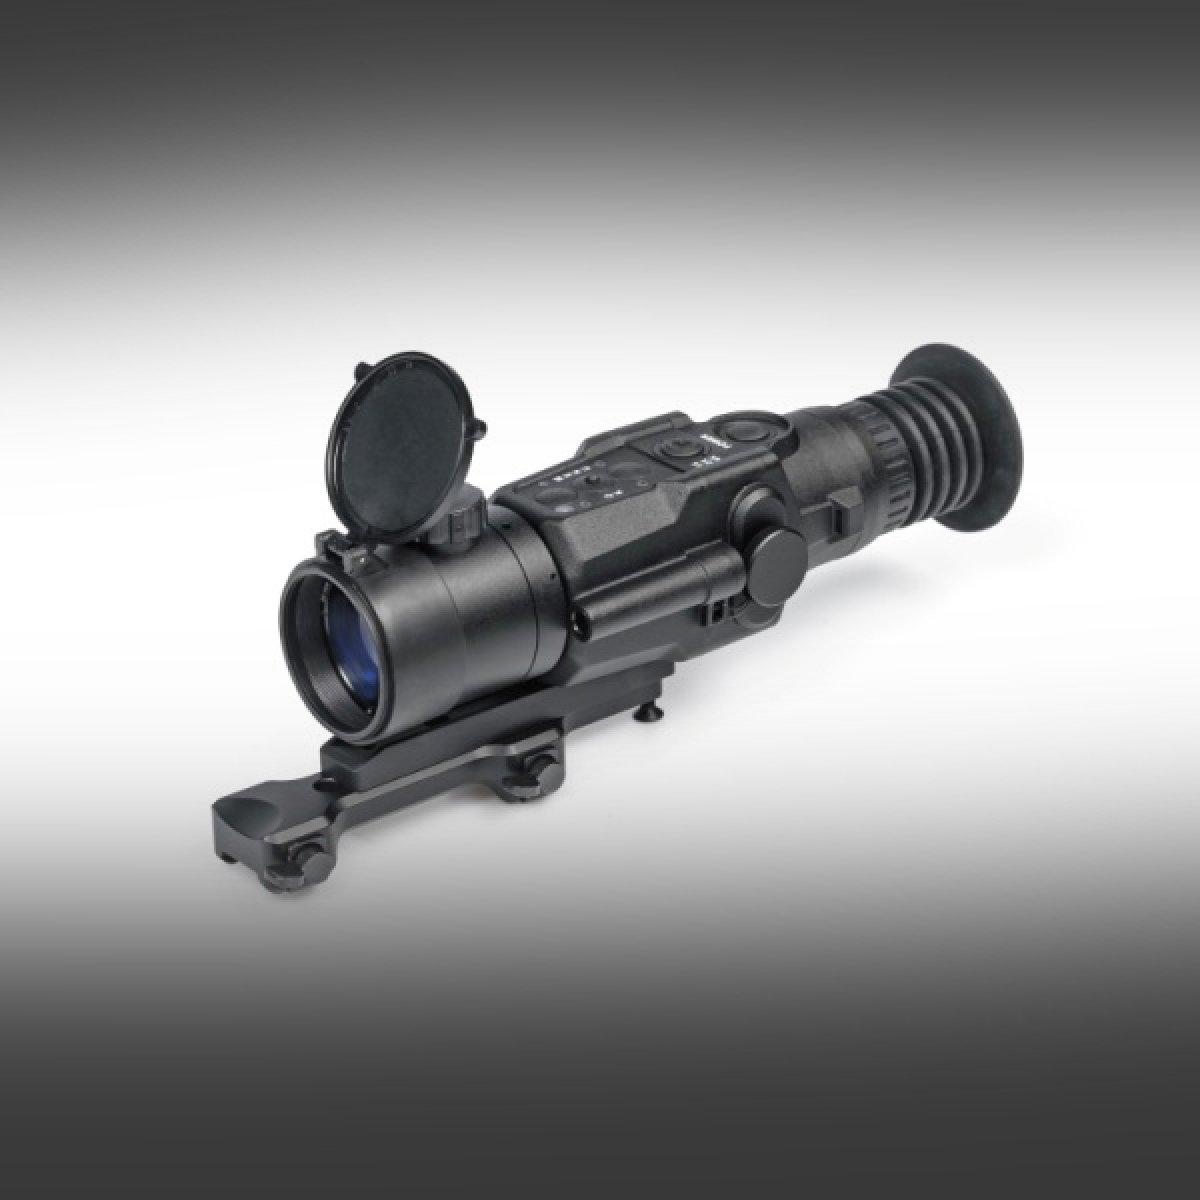 Thermal vision scope Dedal-T2 380 Hunter | MilitaryZone